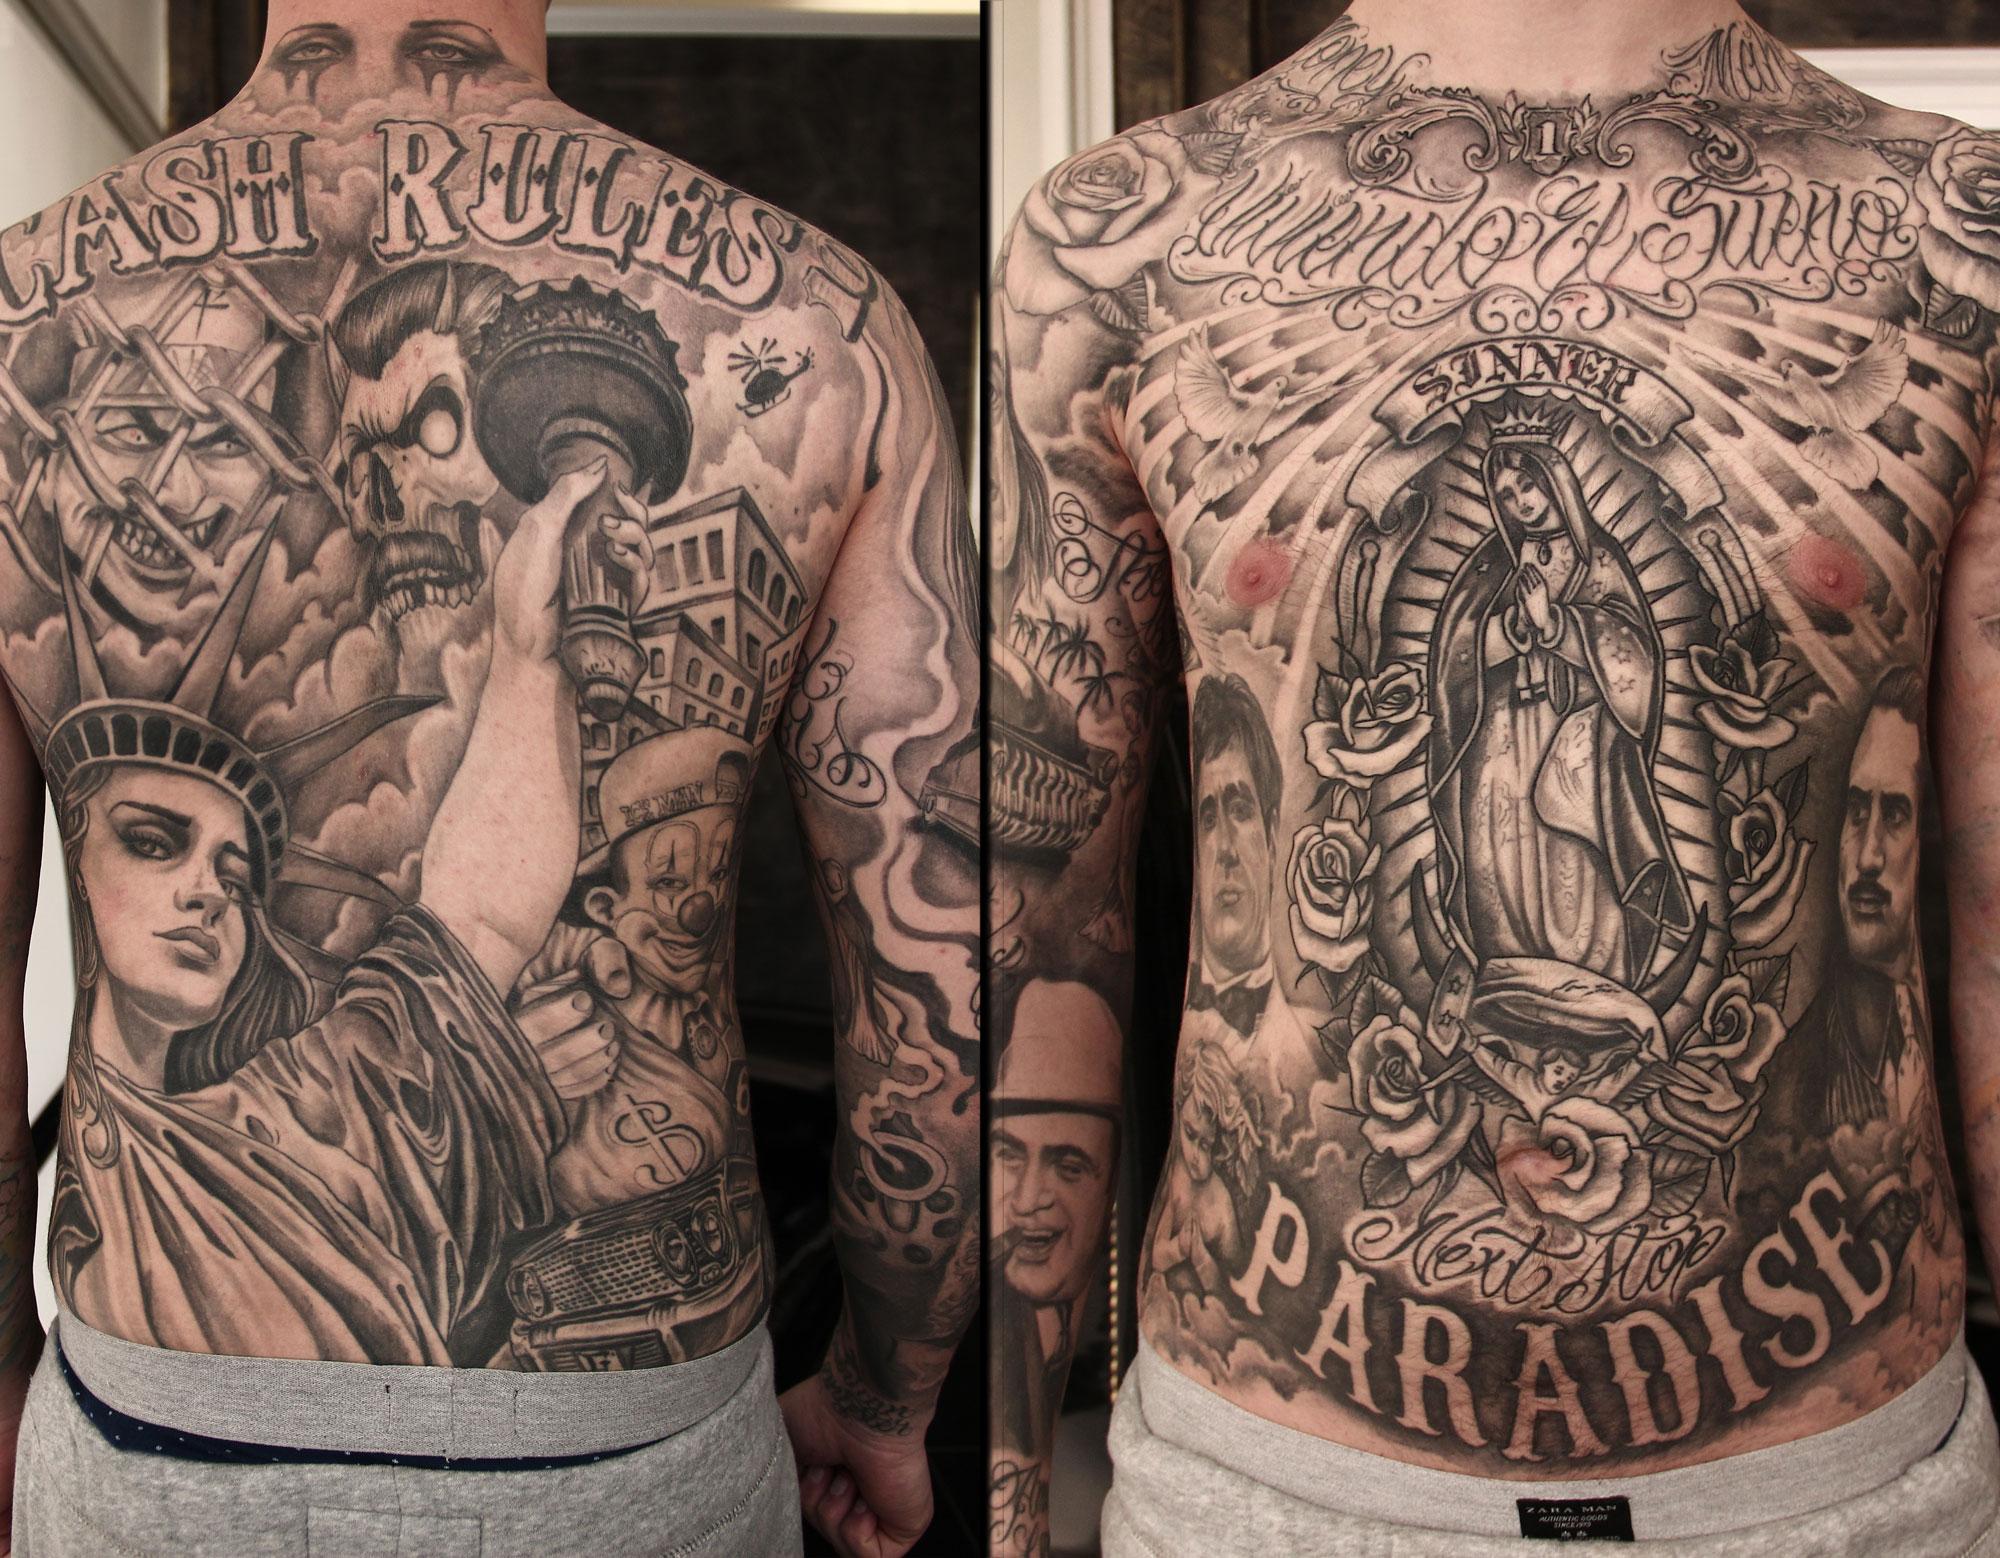 http://www.mividaloca-tattoo.com/images/gallery/6.jpg